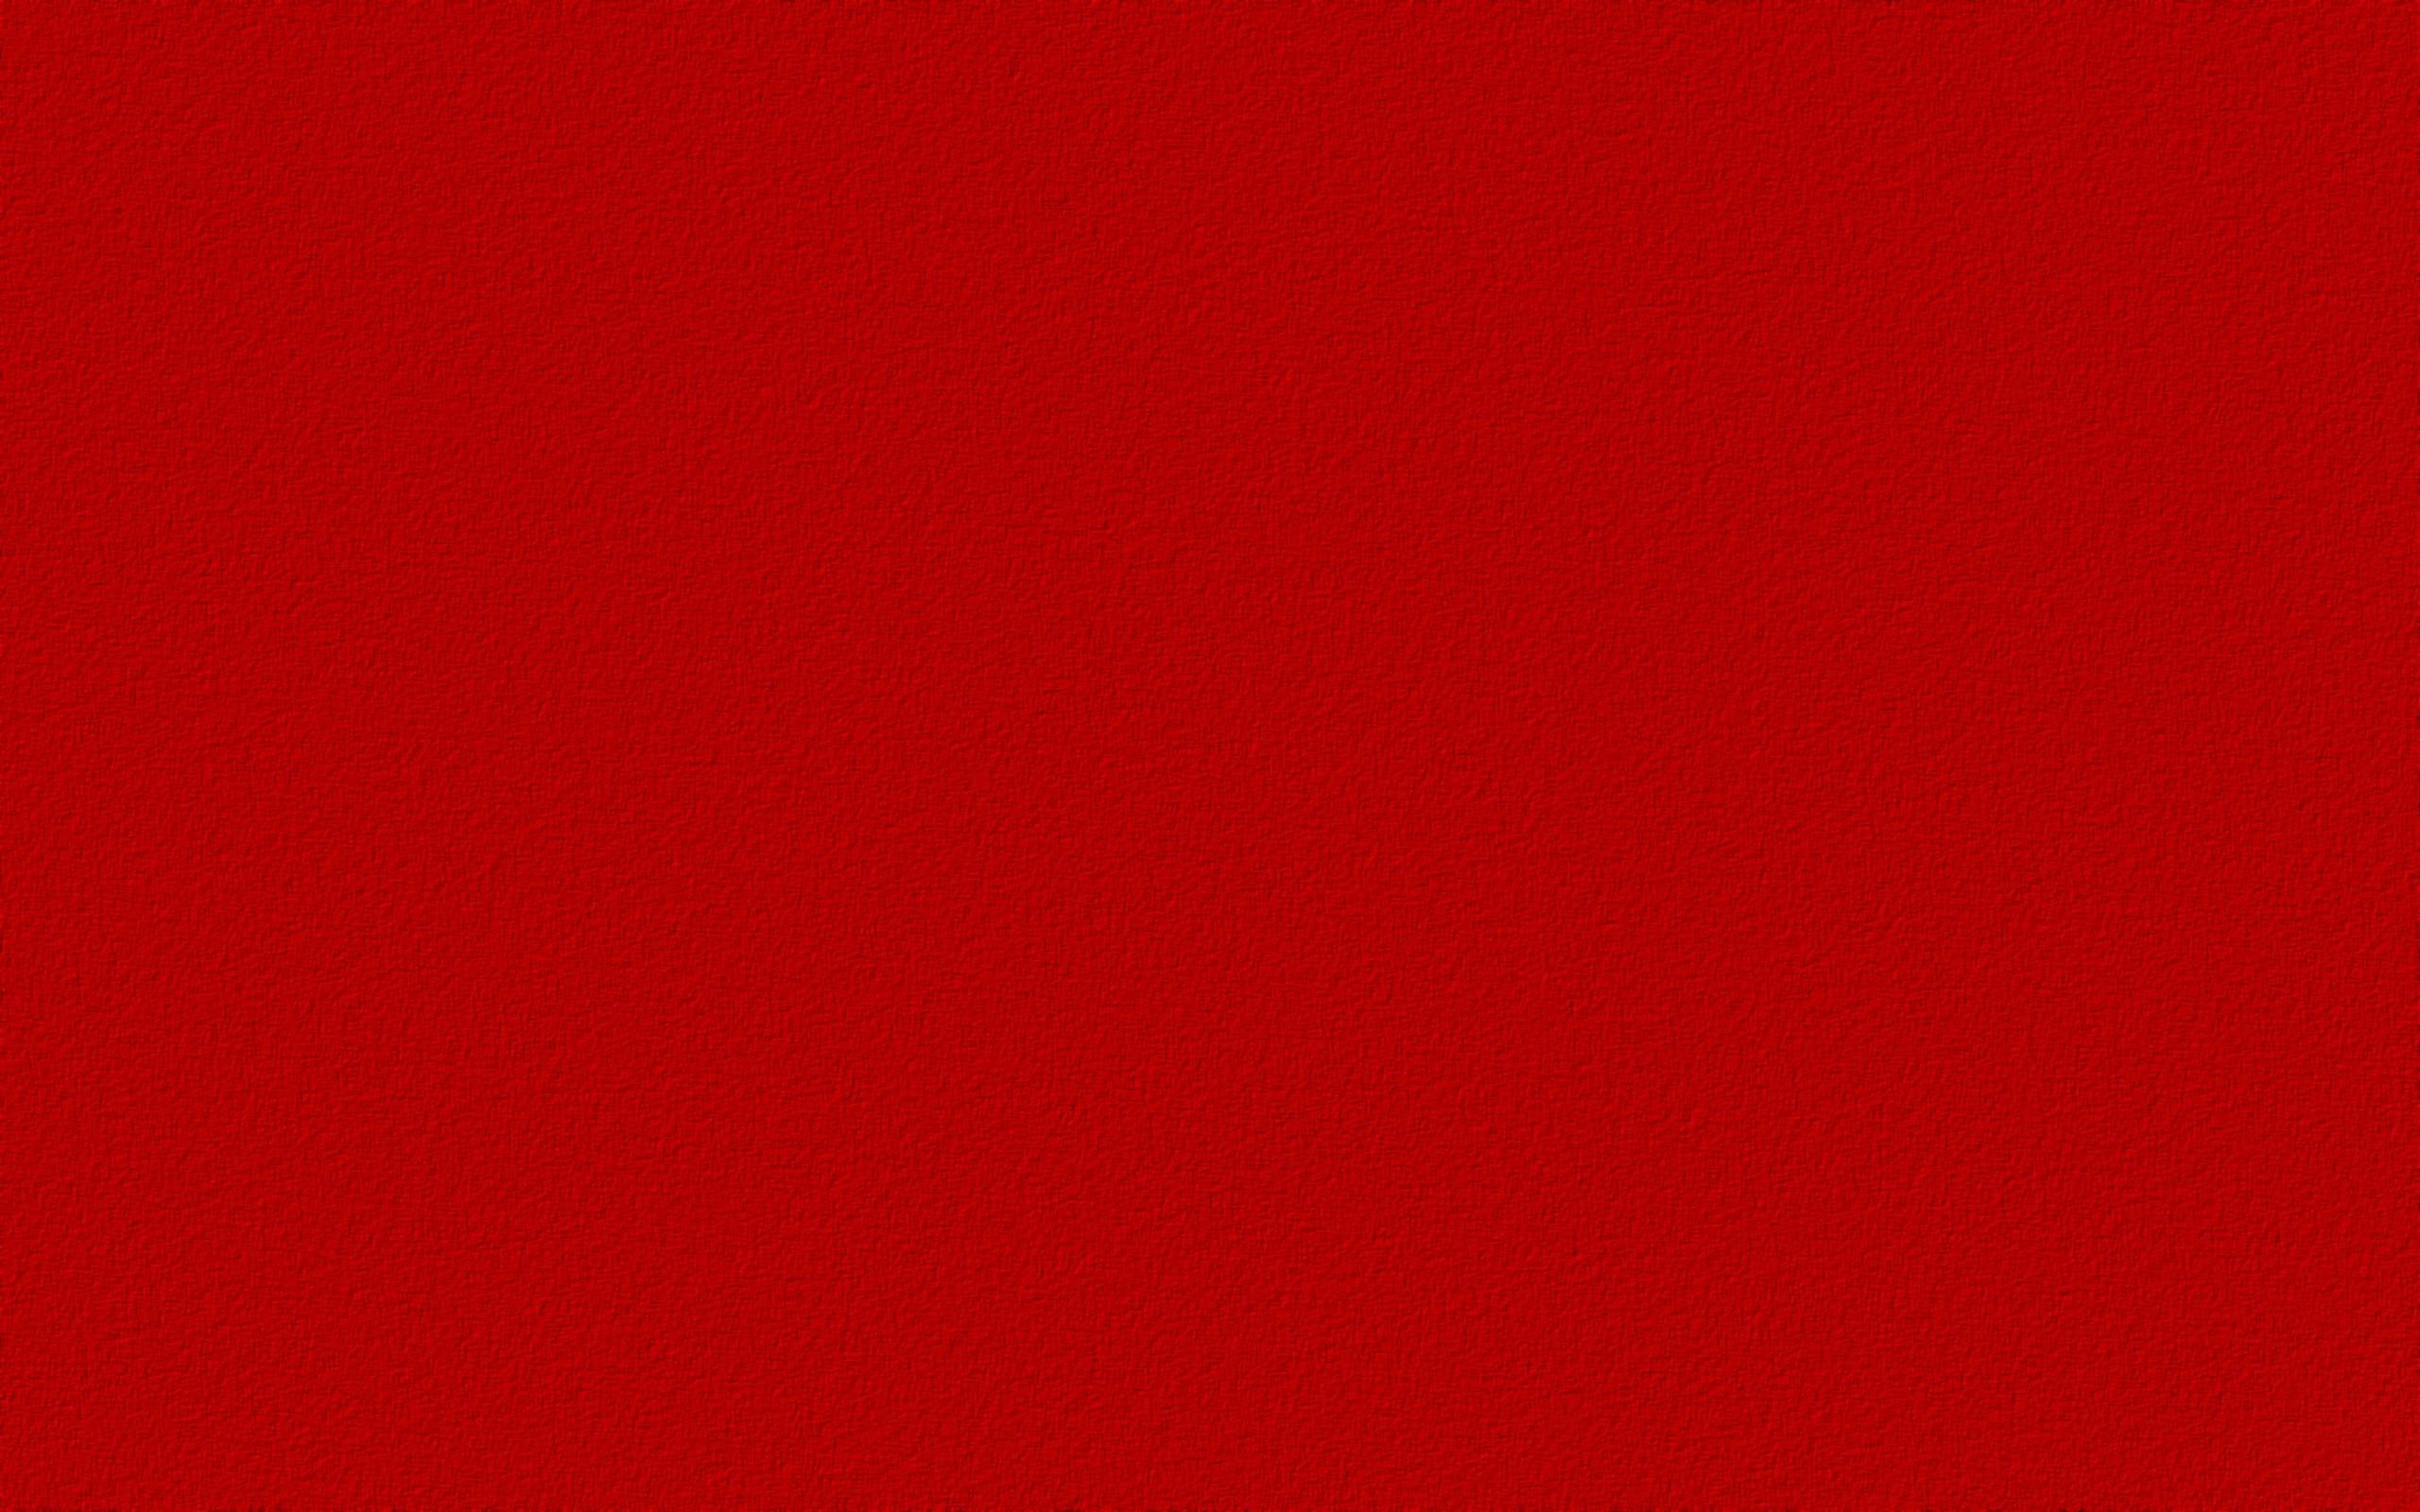 Red 2142 2560 x 1600 – WallpaperLayer.com